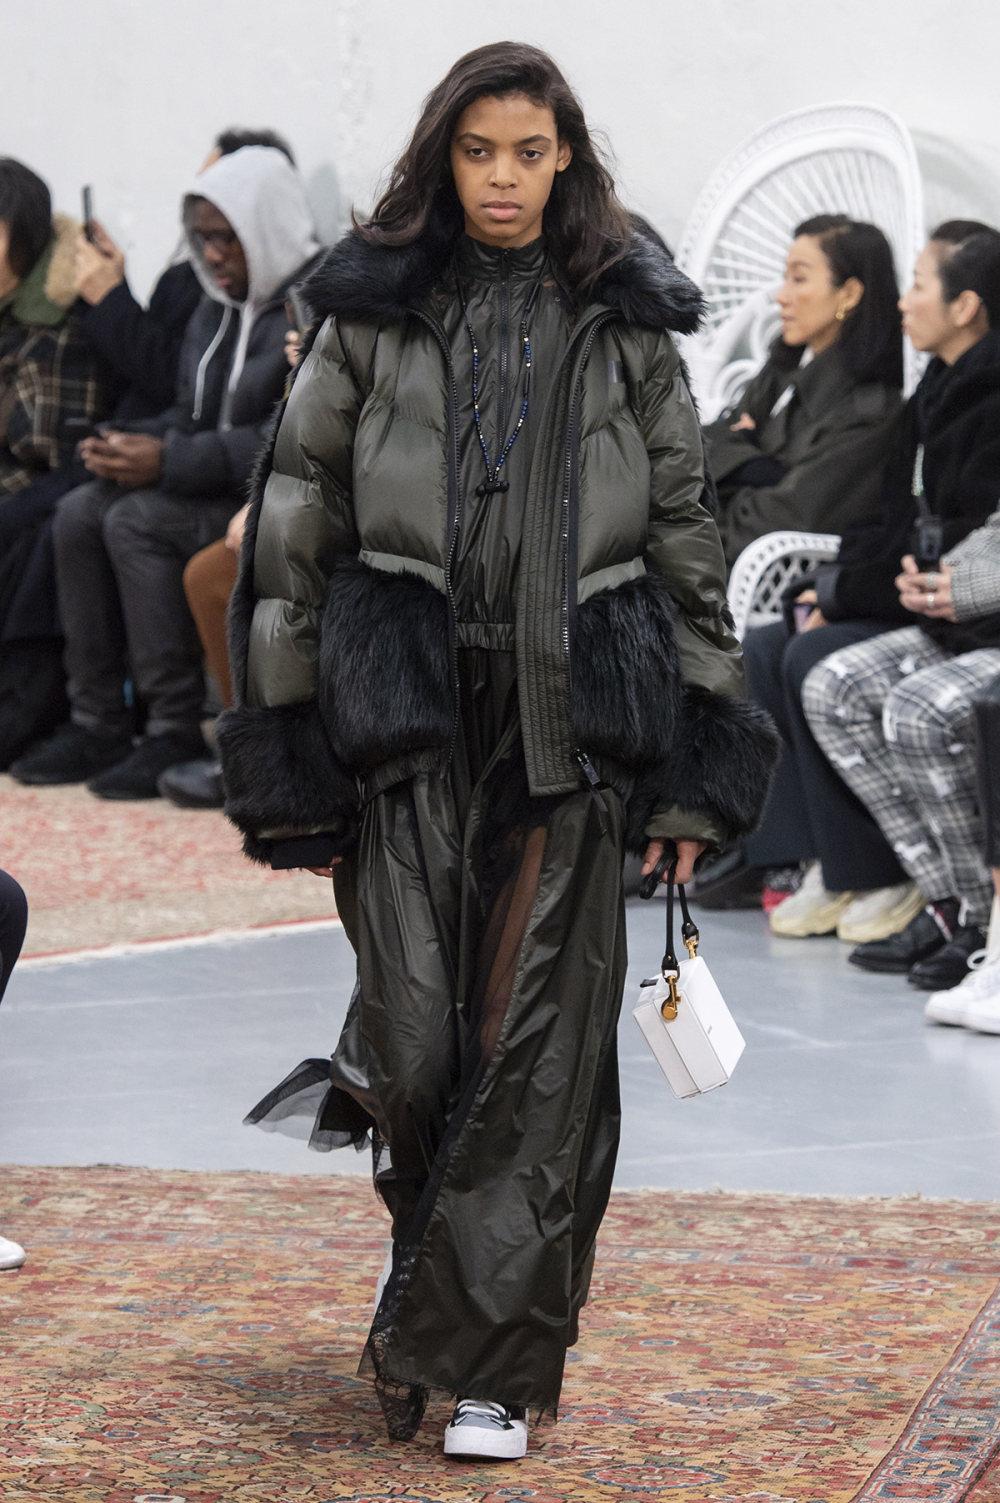 Sacai时装系列超大号黑色圆领毛衣和长款绿色北欧毛衣连衣裙-10.jpg